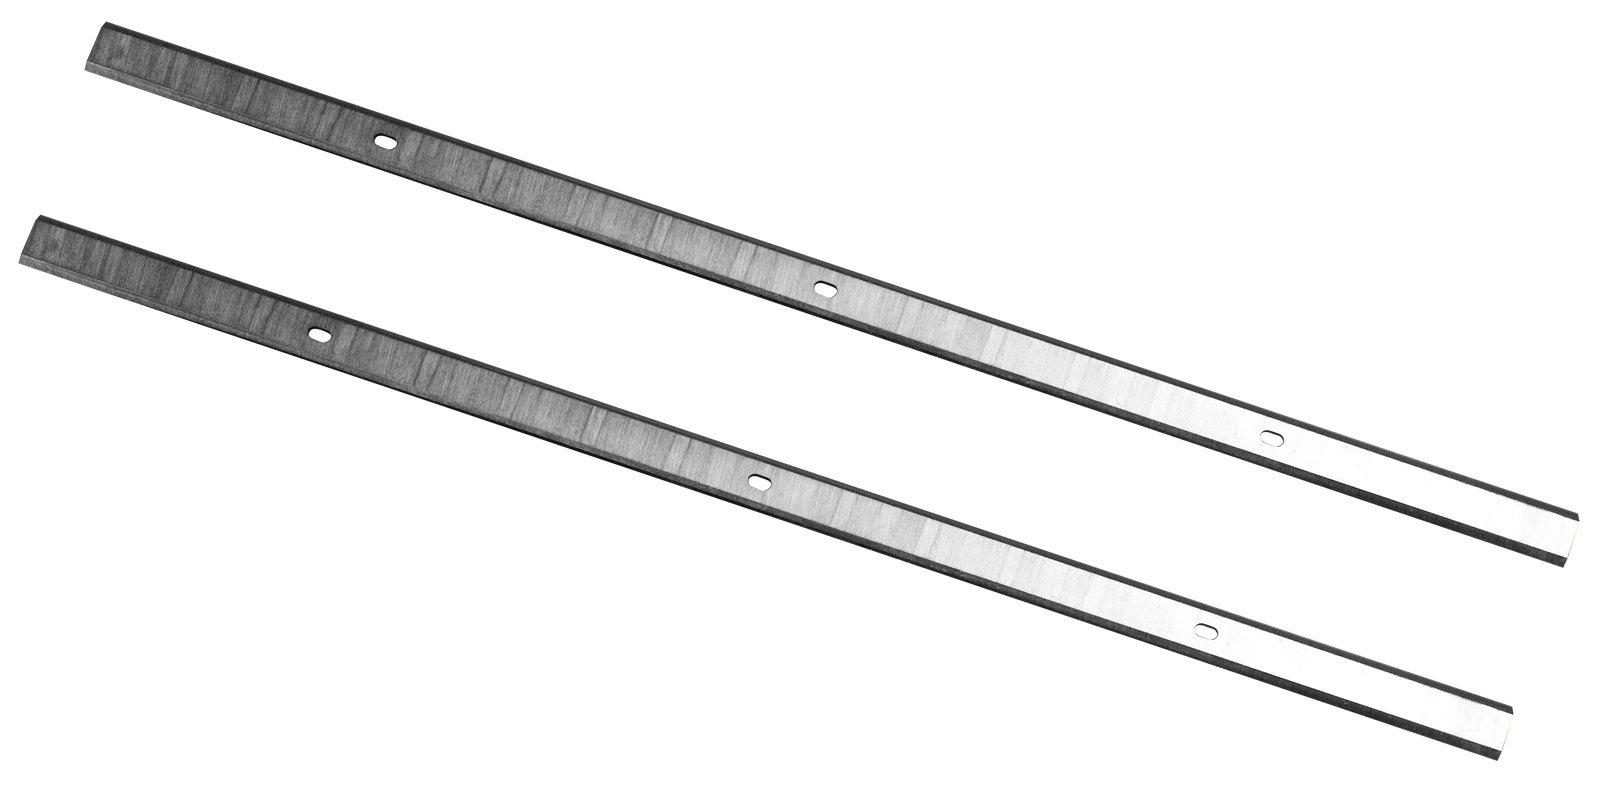 POWERTEC 128021 13-Inch HSS Planer Knives for Craftsman 21743, Set of 2